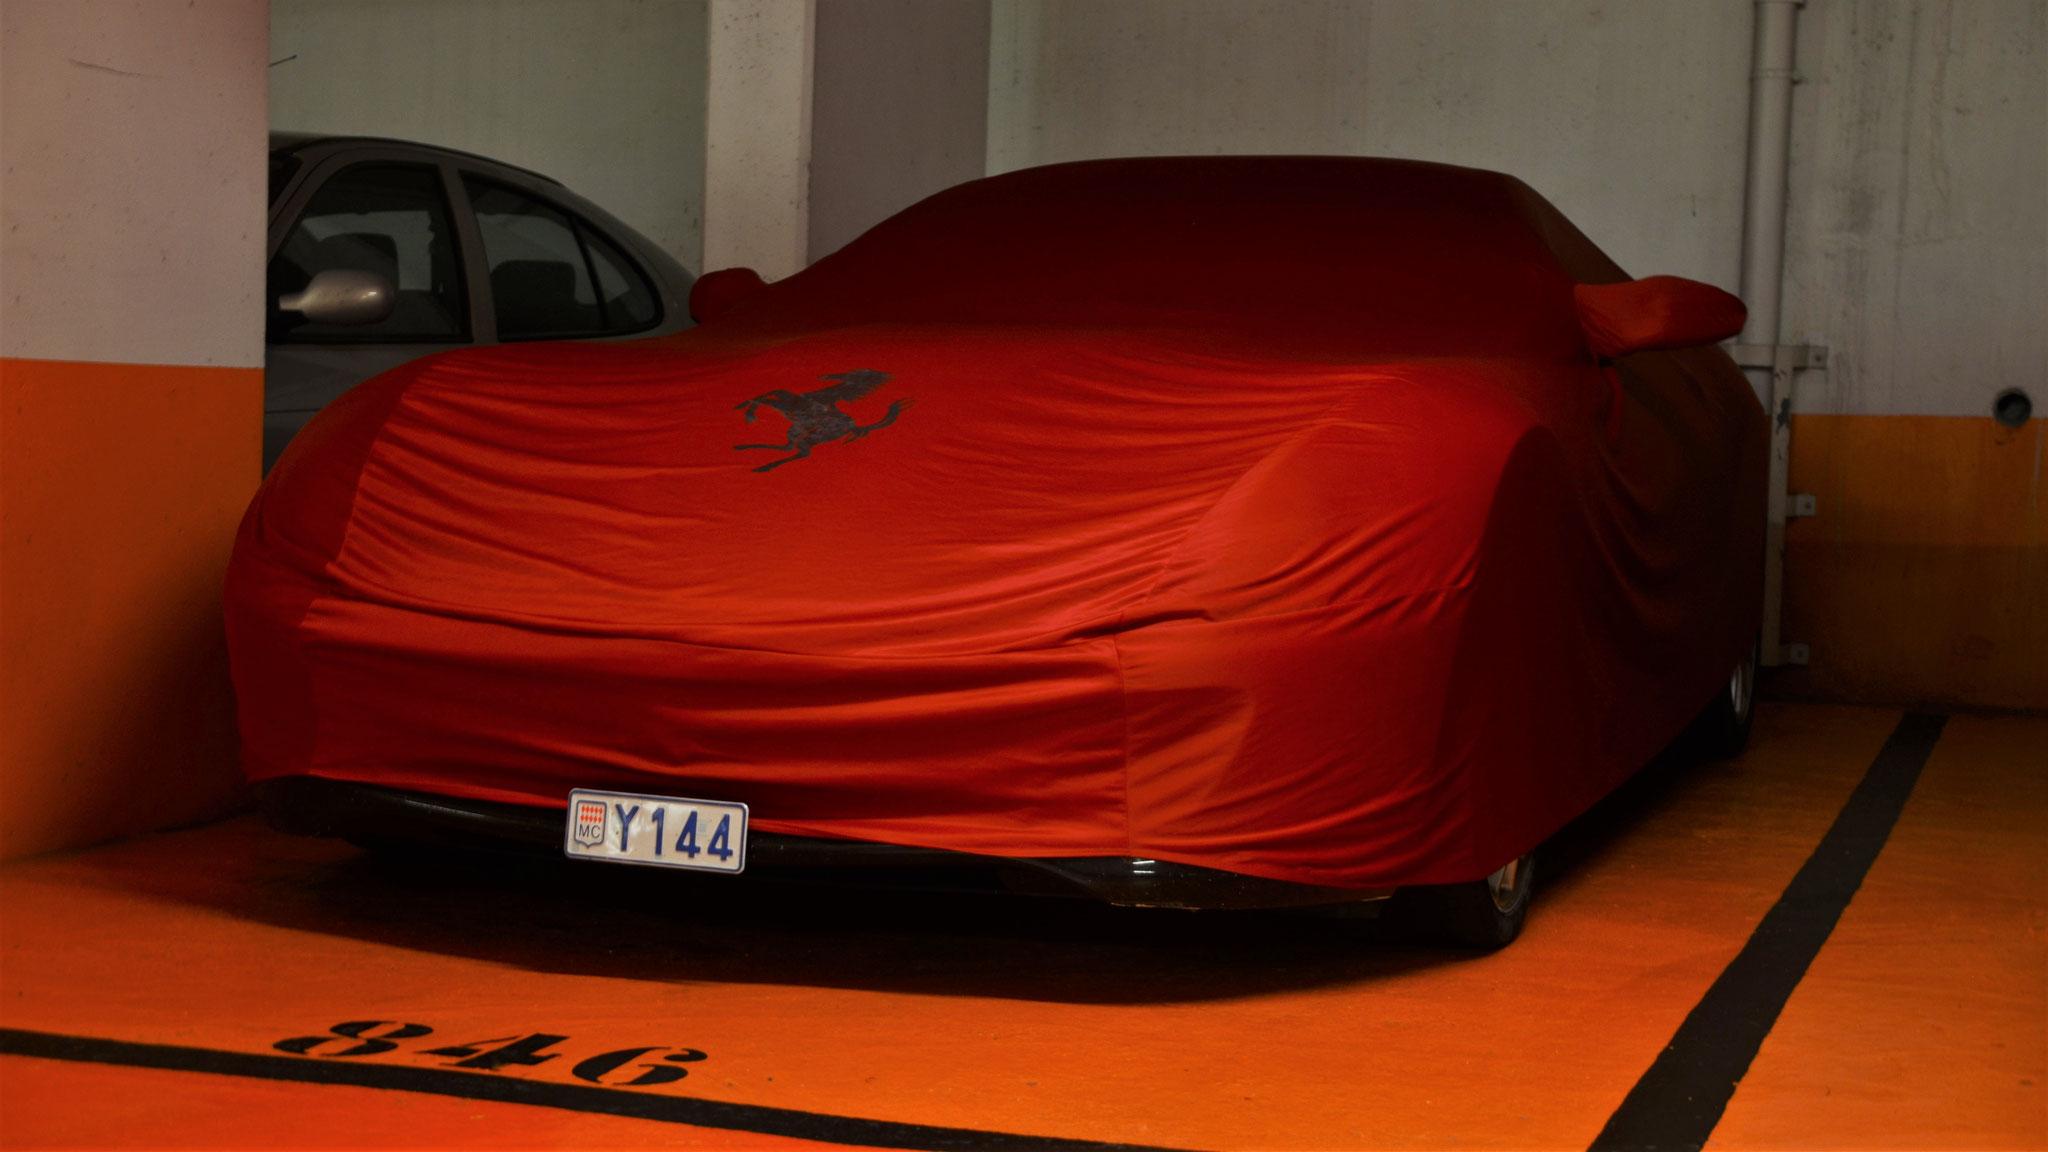 Ferrari 599 GTB - Y144 (MC)